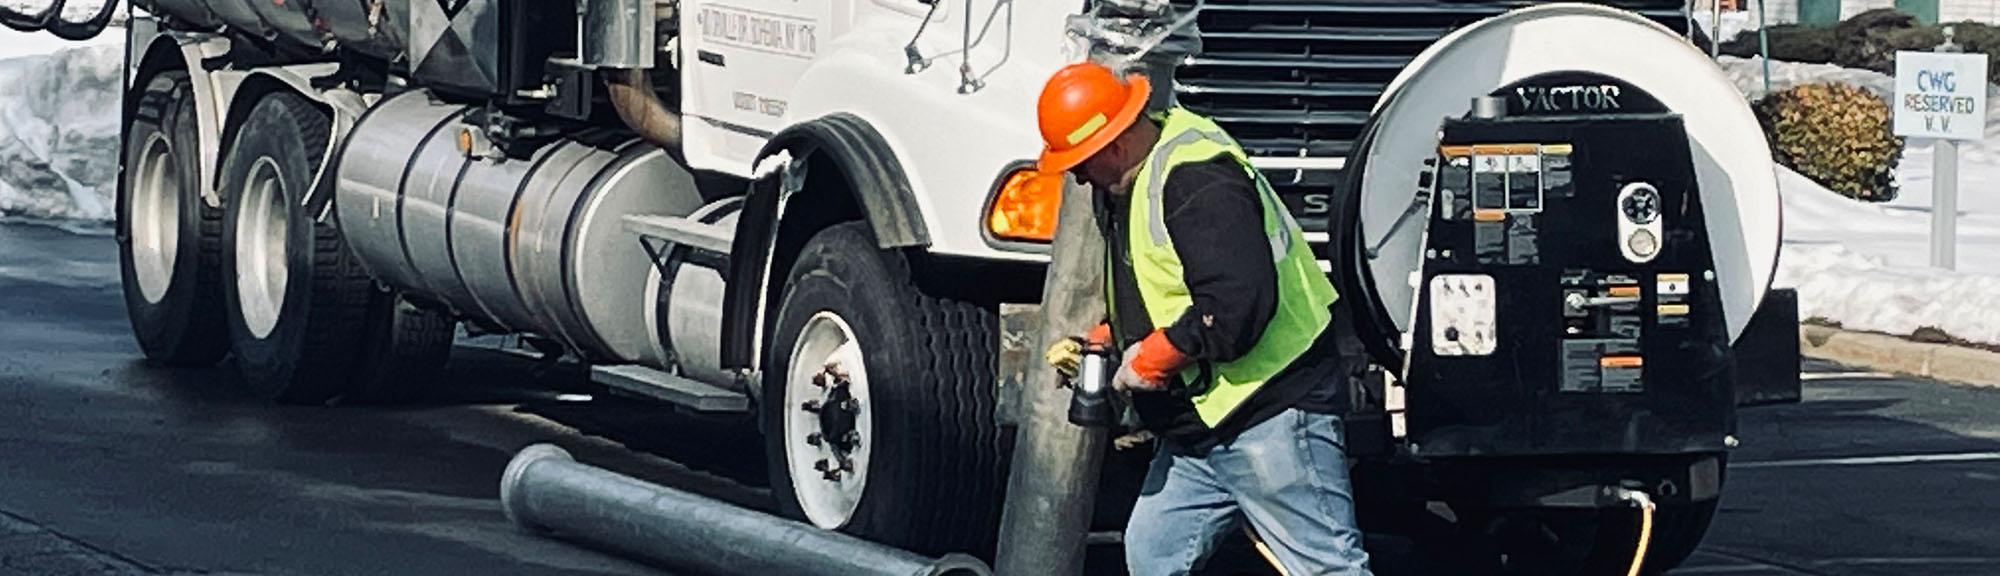 storm drain maintenance